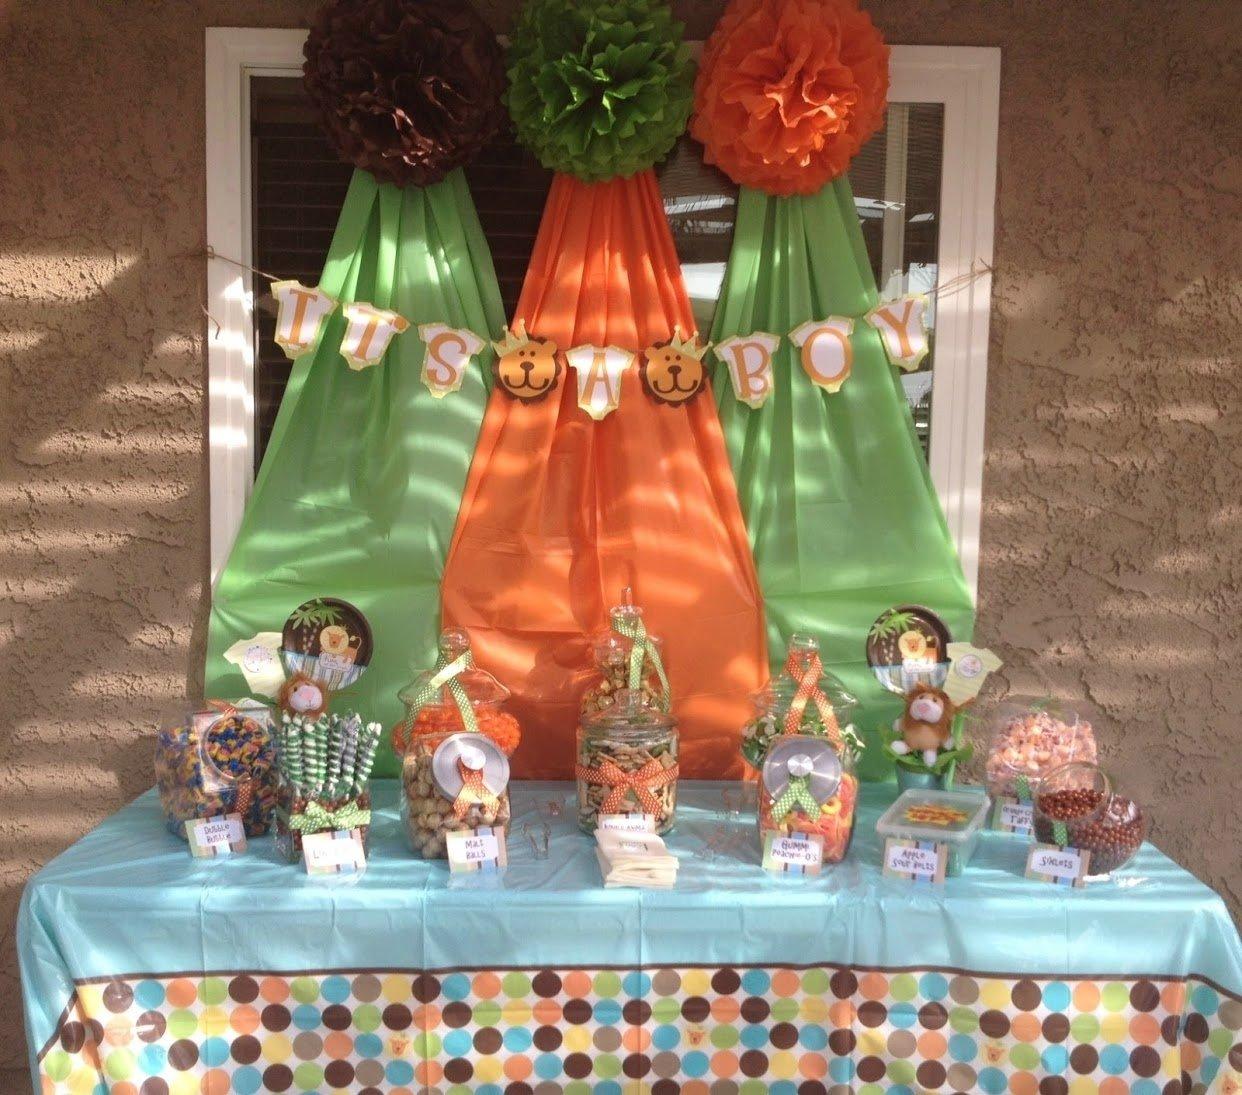 10 Great Jungle Safari Baby Shower Ideas photo safari baby shower decorations image